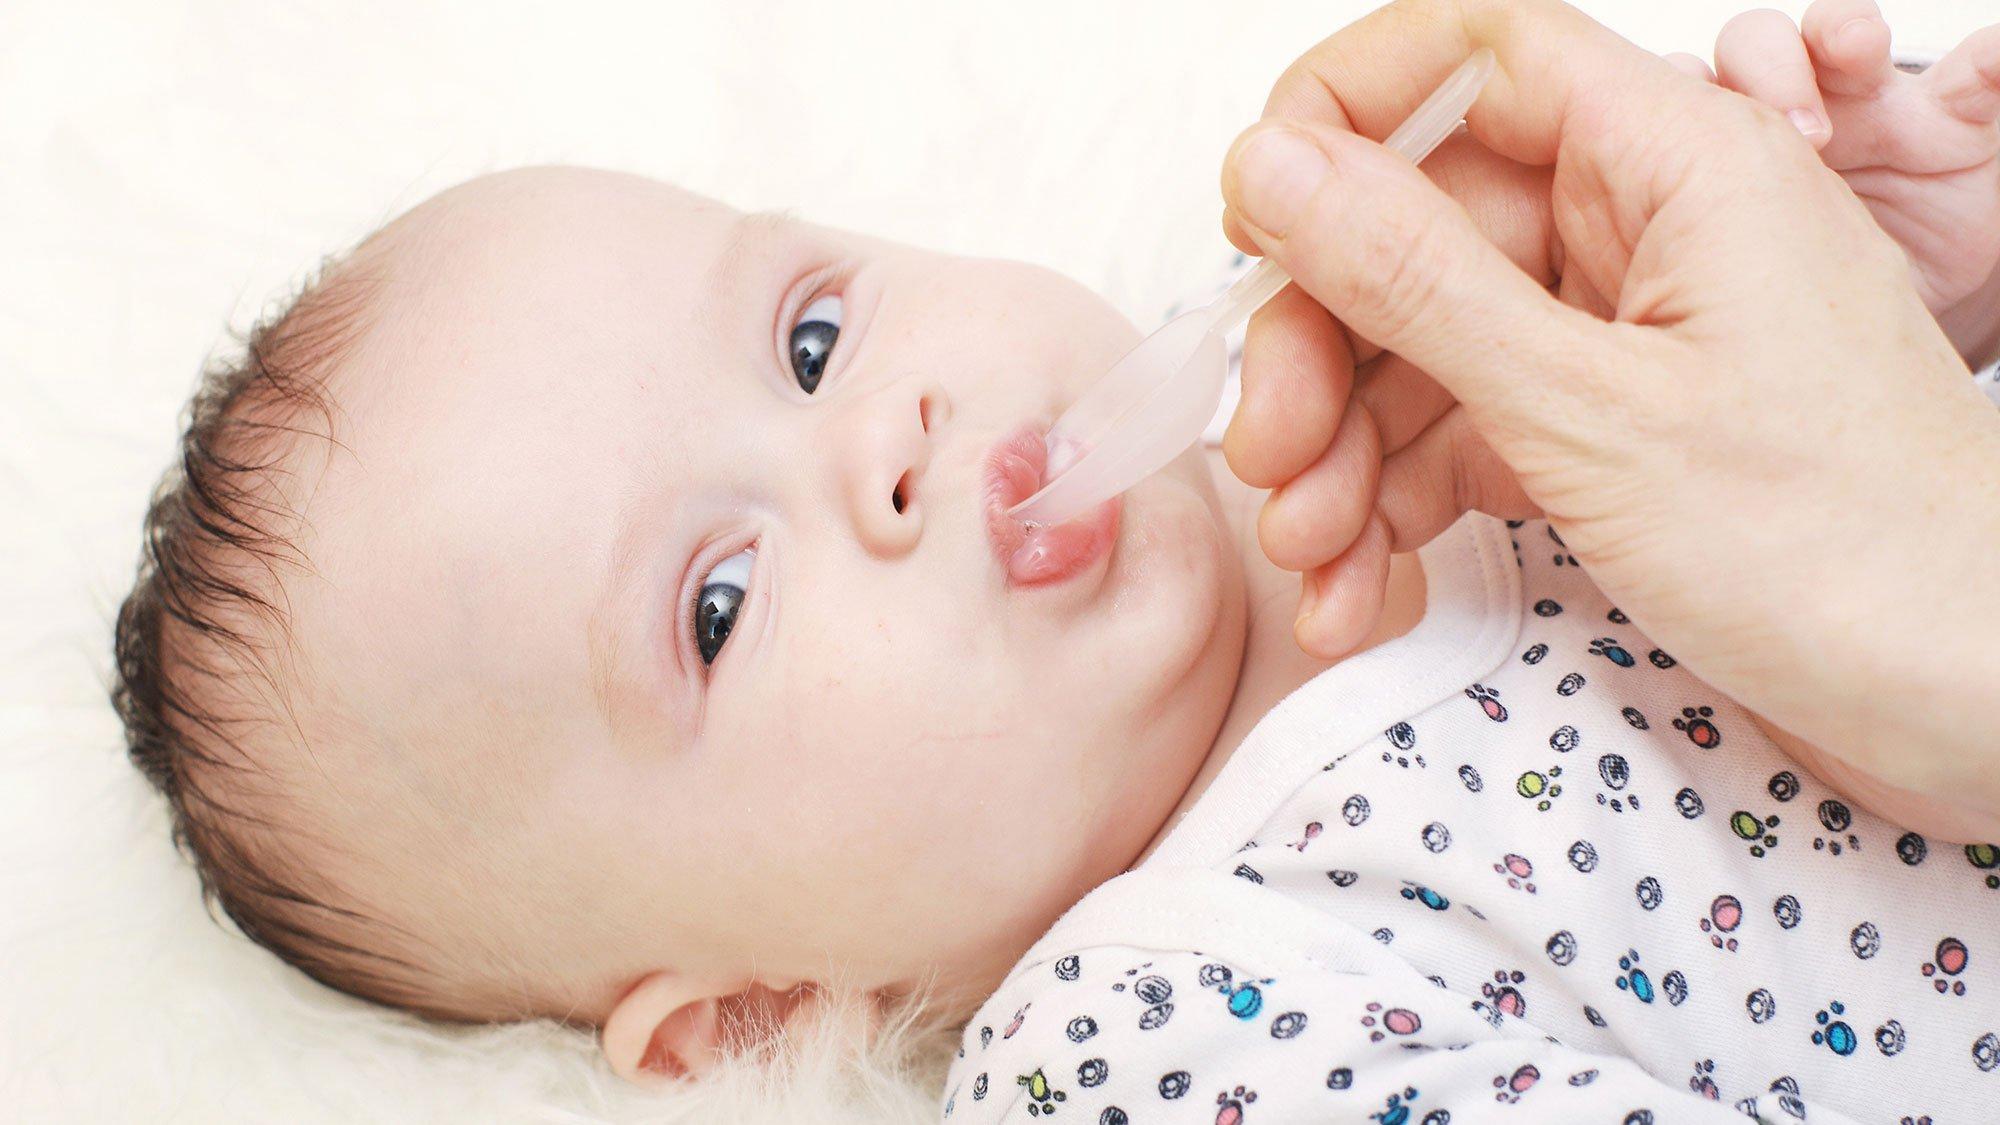 Младенцу дают сок из ложечки